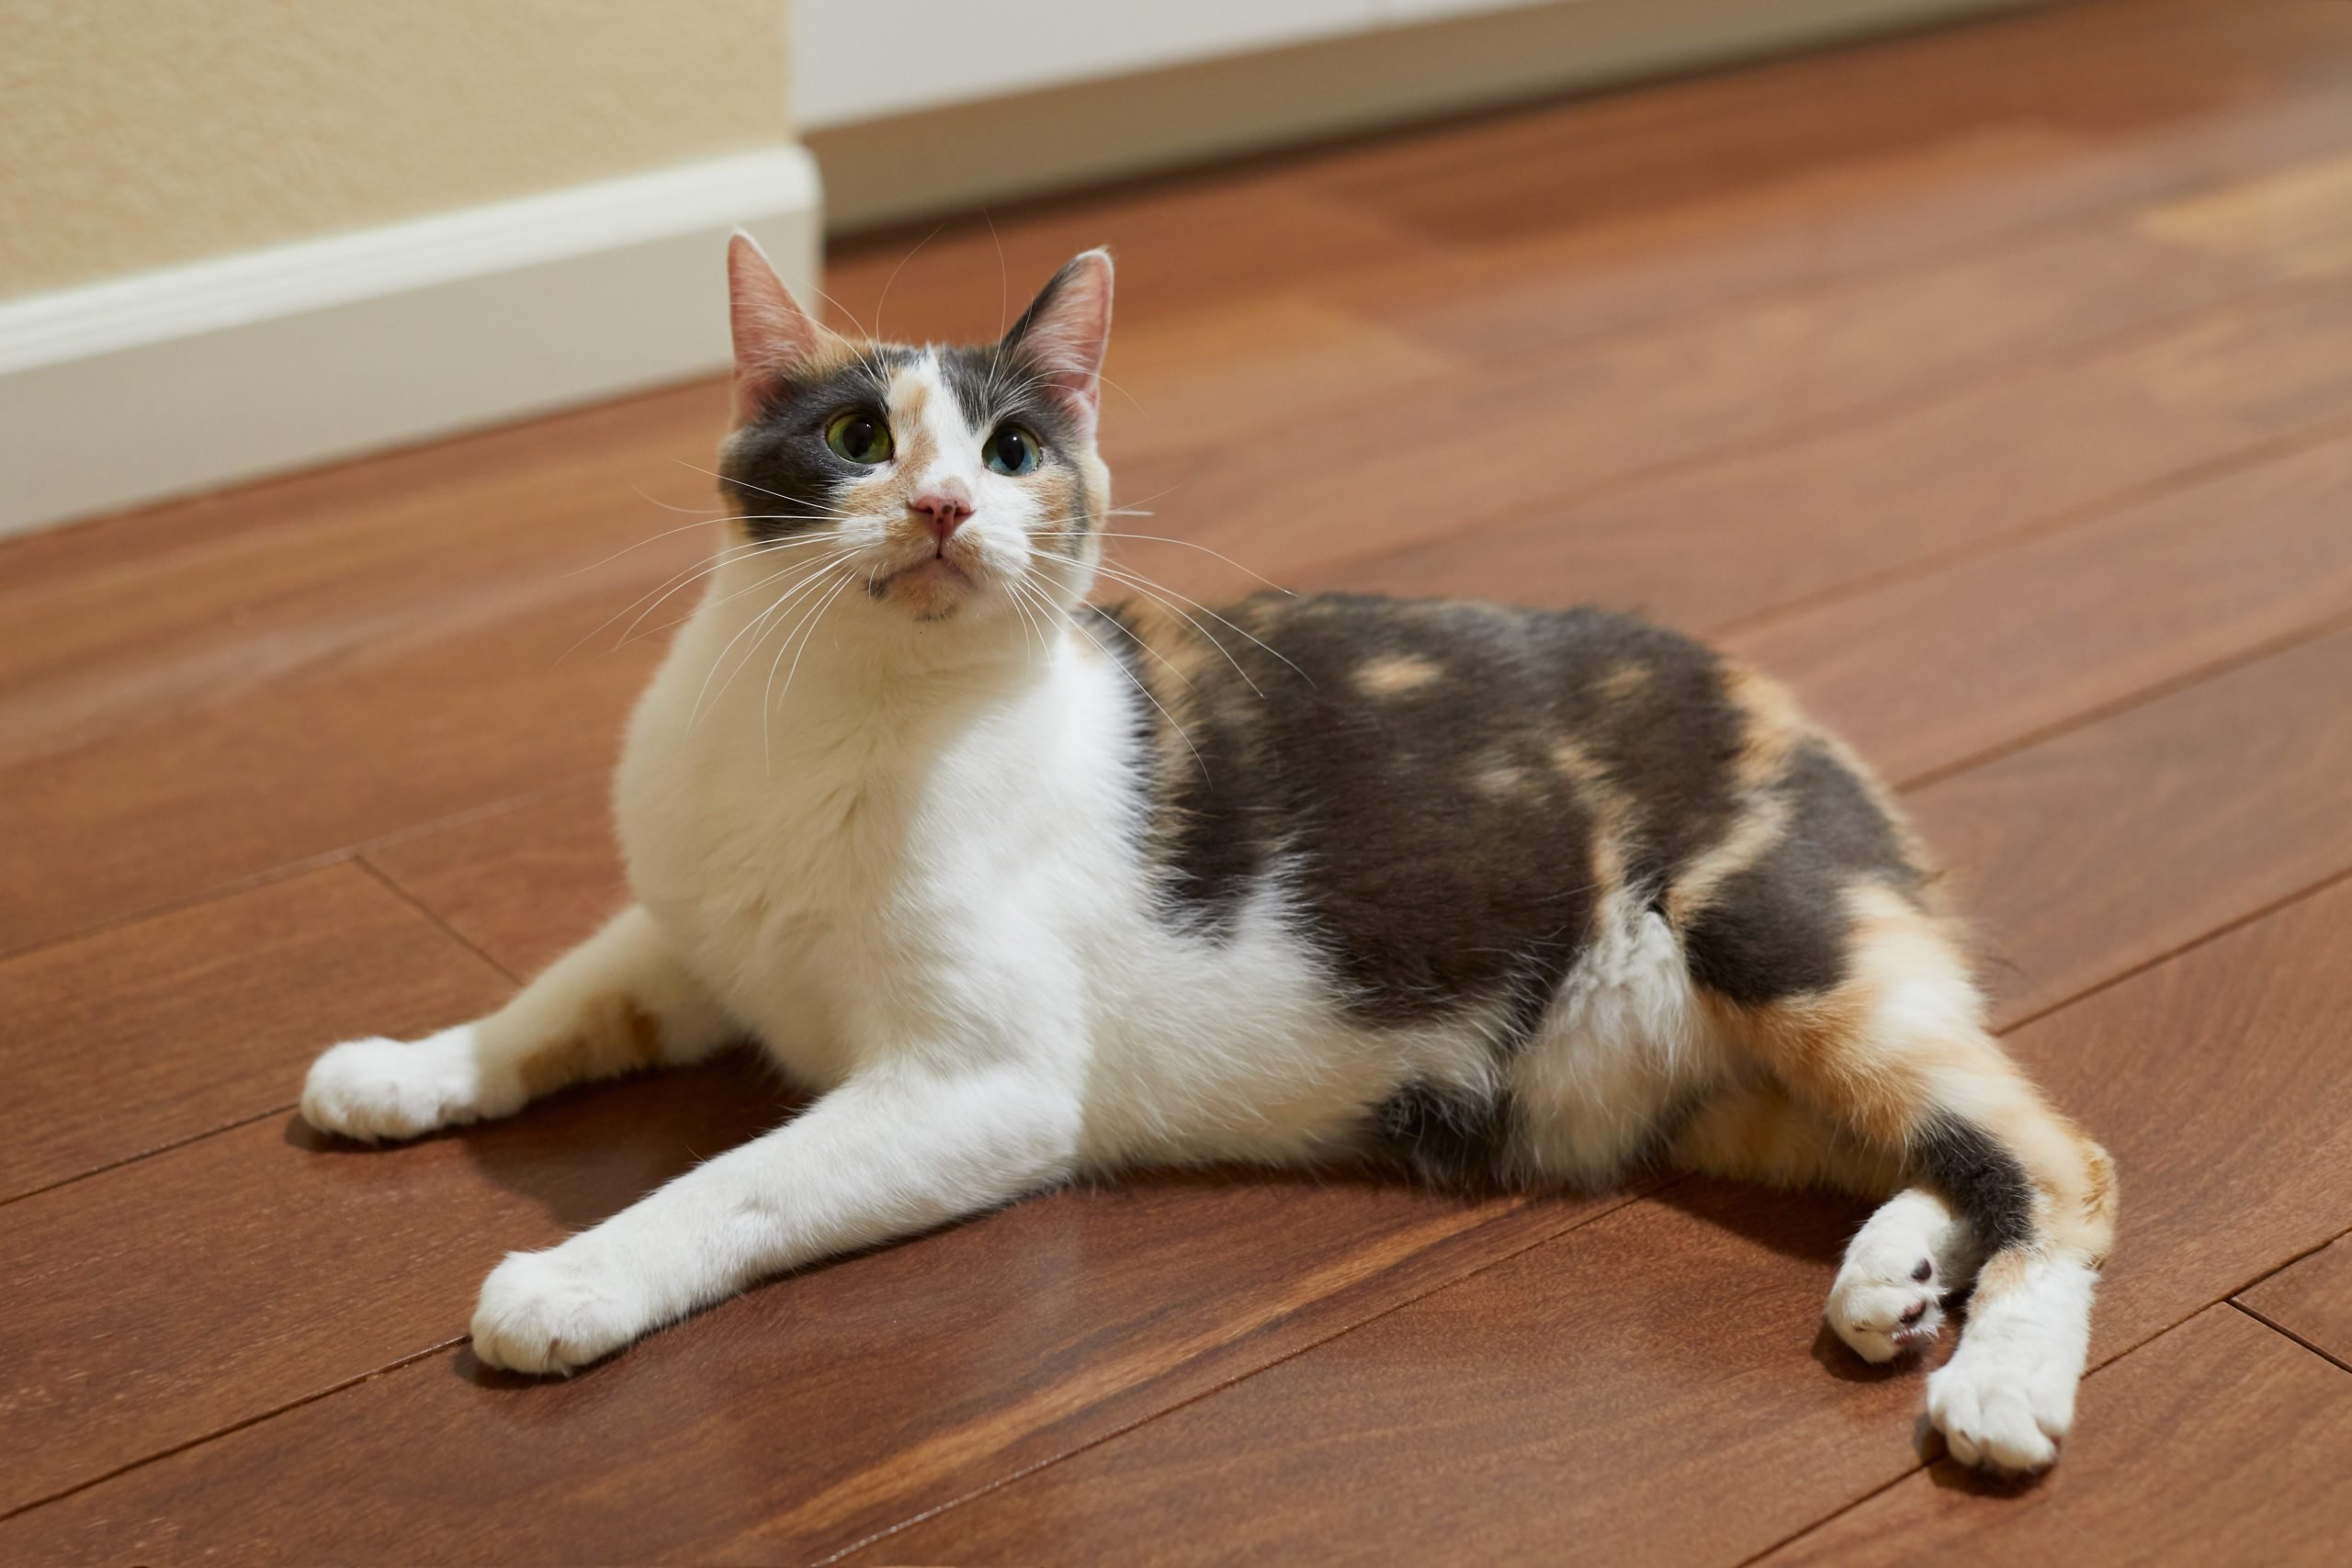 A playful manx calico cat